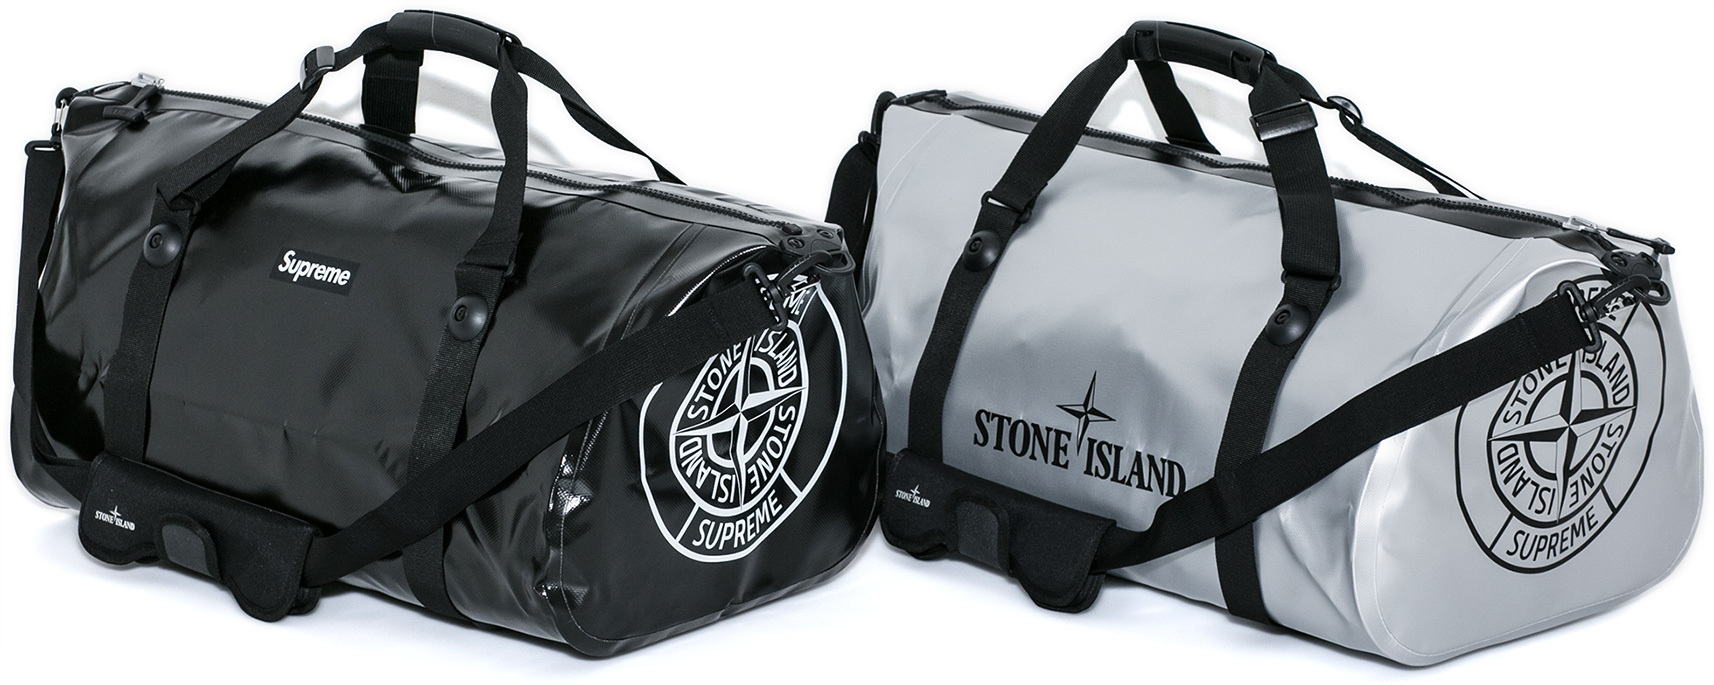 Supreme x Stone Island 2016